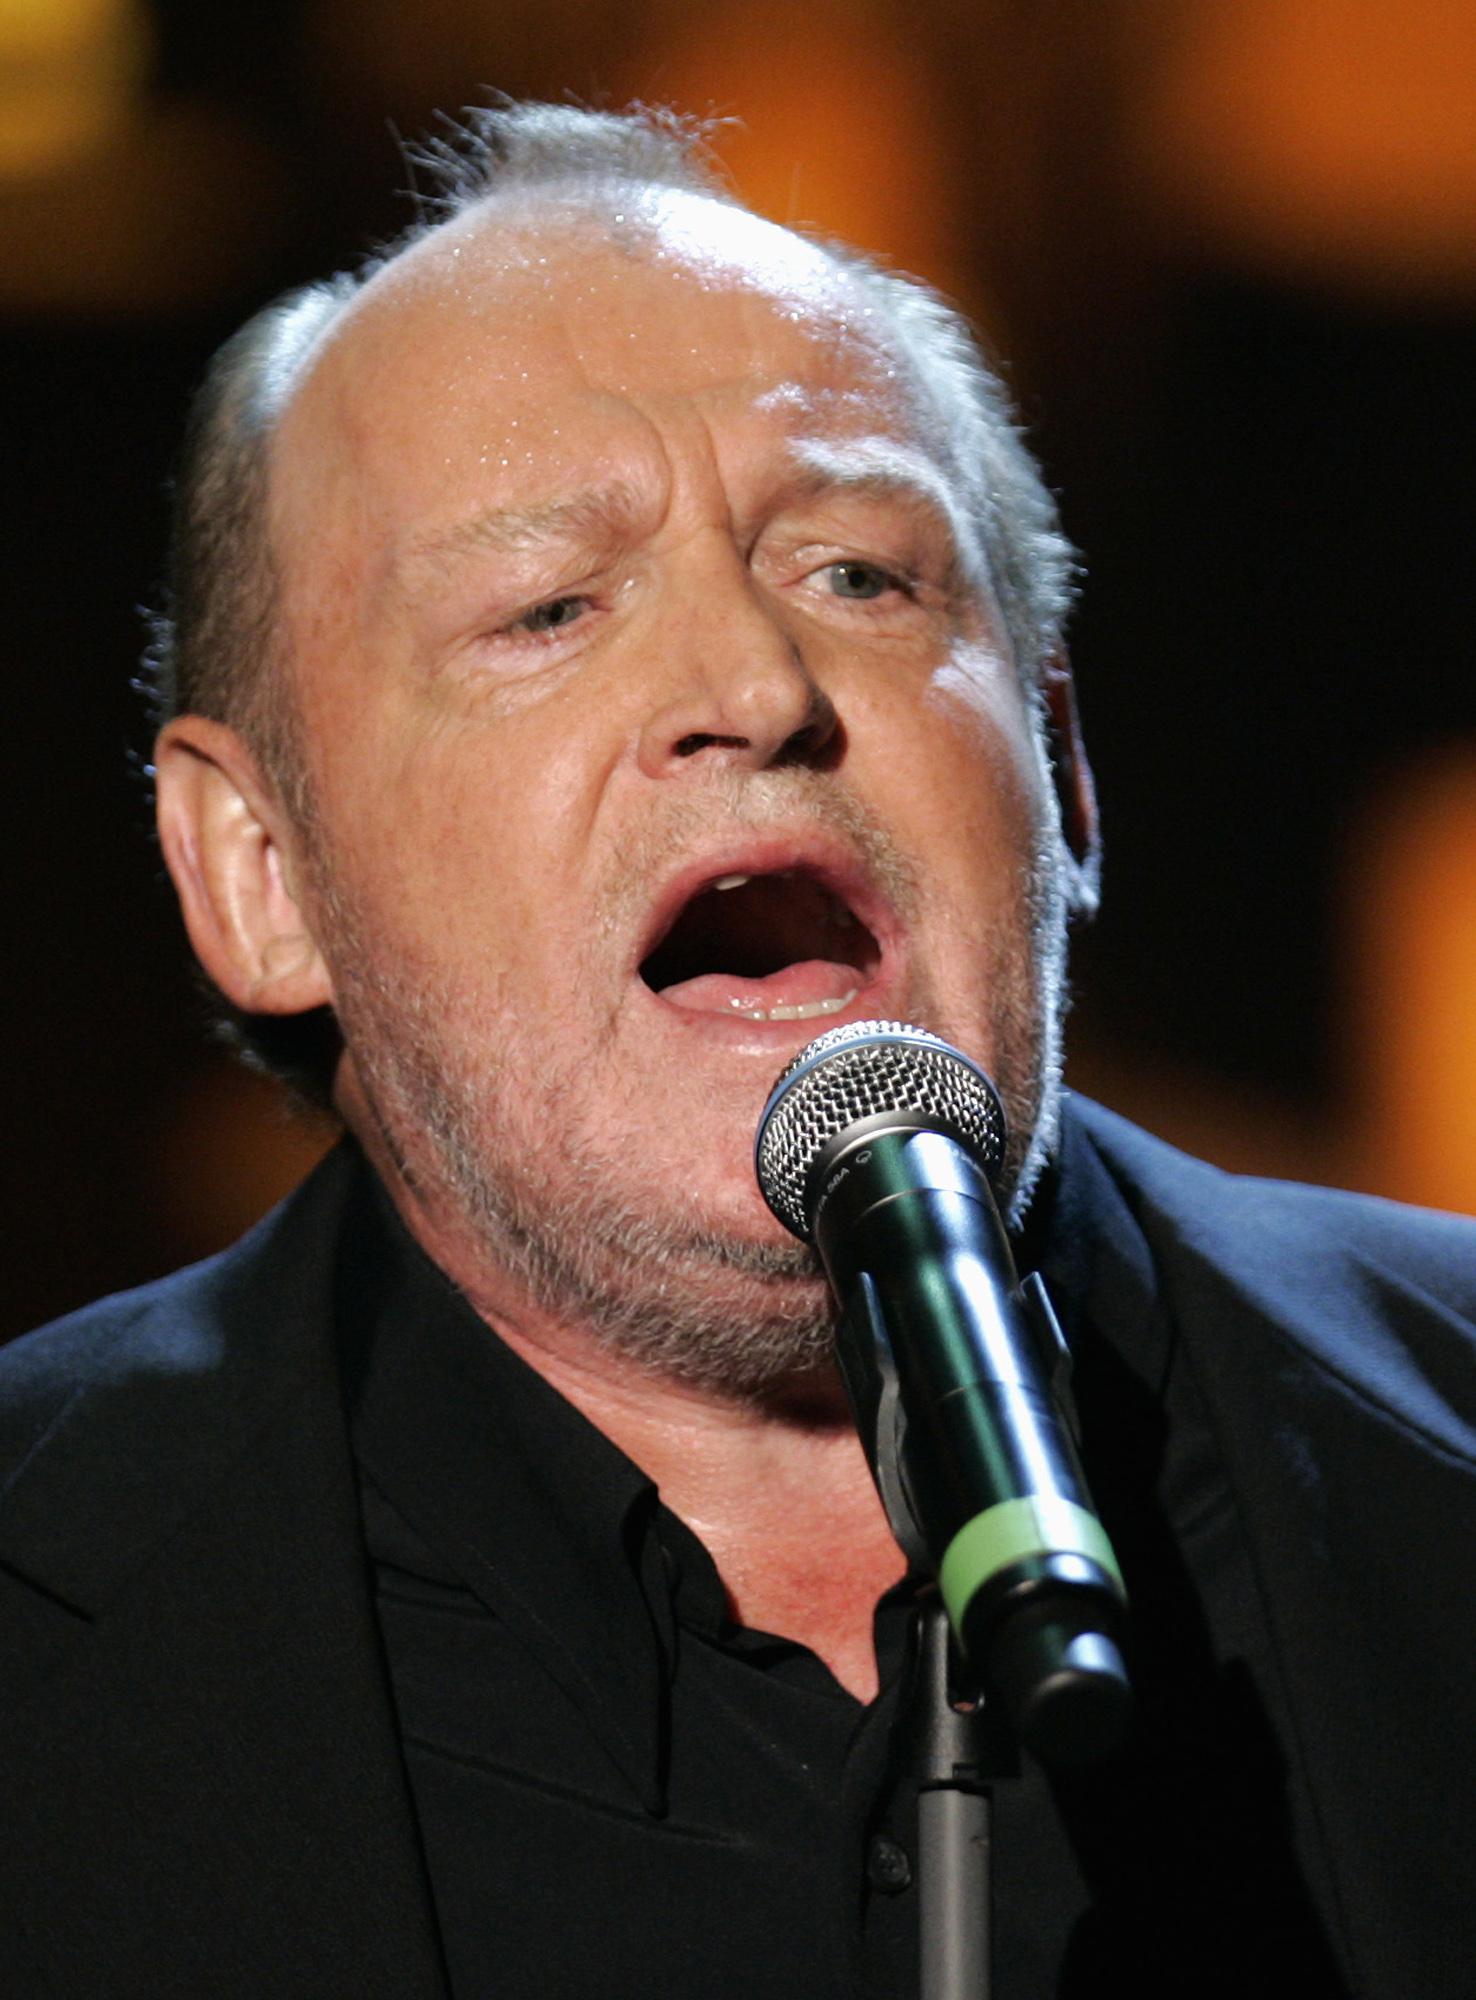 singer joe cocker dies at age 70  agent says